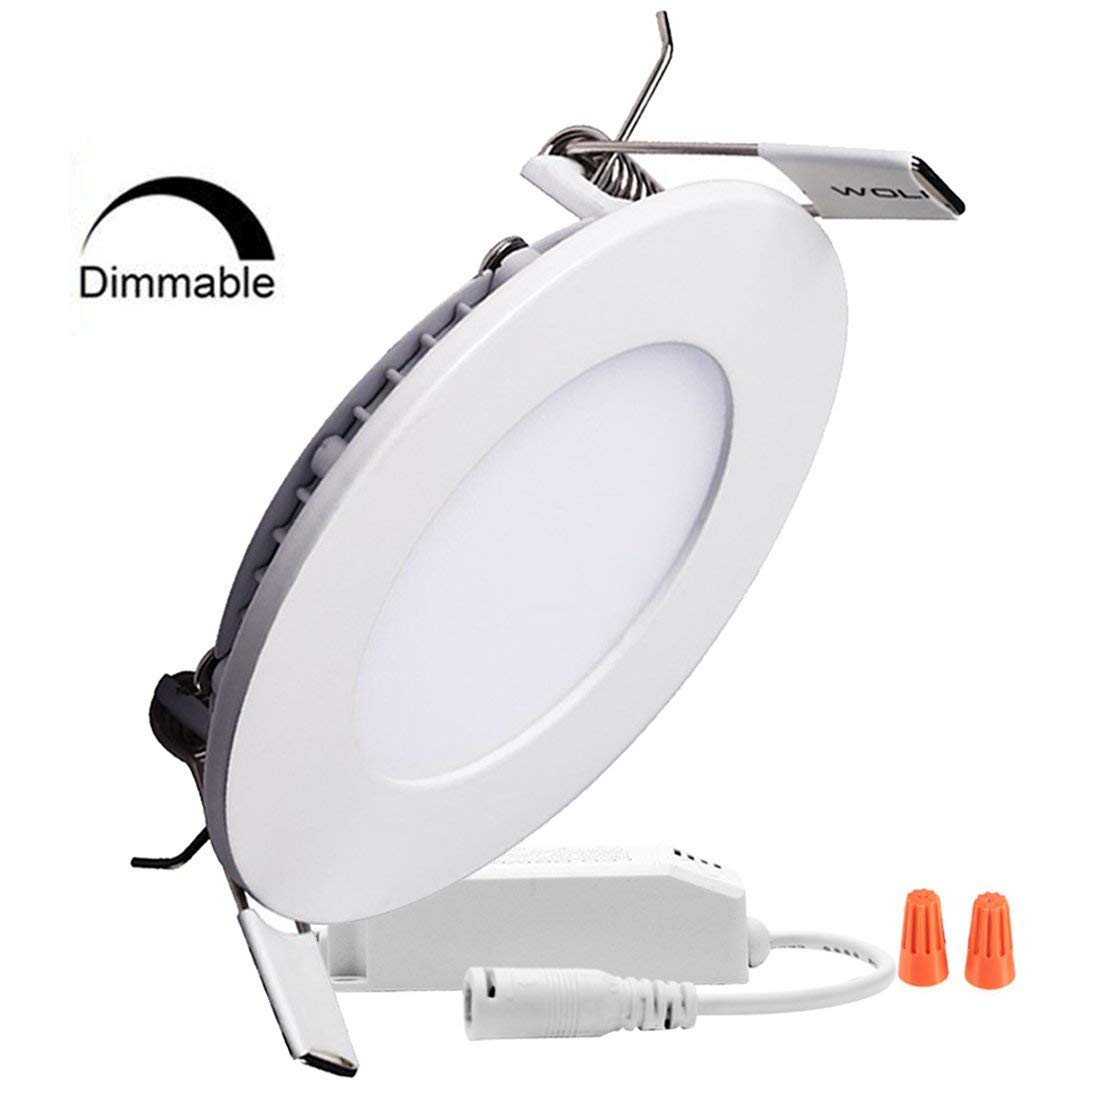 Sugo 調光機能付き ラウンドLEDパネルライト 超薄型 スリム 6000K-6500K クールホワイト 埋込型天井ライト ホームオフィス 商業用照明パネル 24 Watts B07PYD8QTT  24 Watts